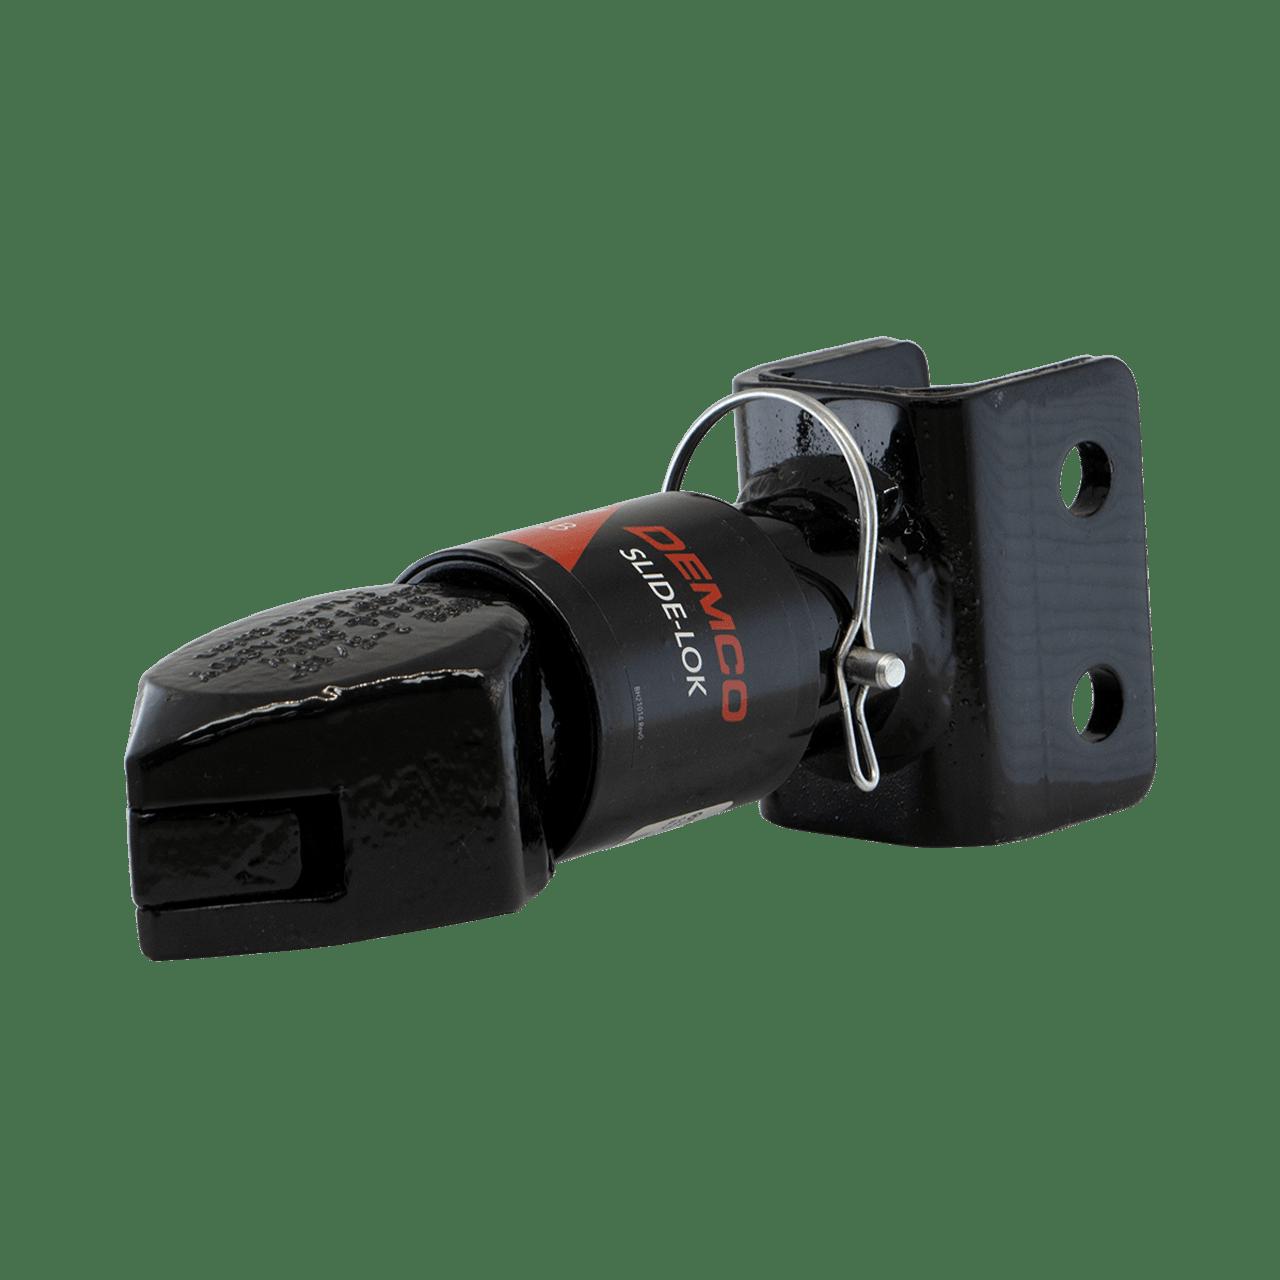 "05557-81 --- Demco Slide-Lock Adjustable 2-5/16"" Coupler - 12,500 lbs Capacity"